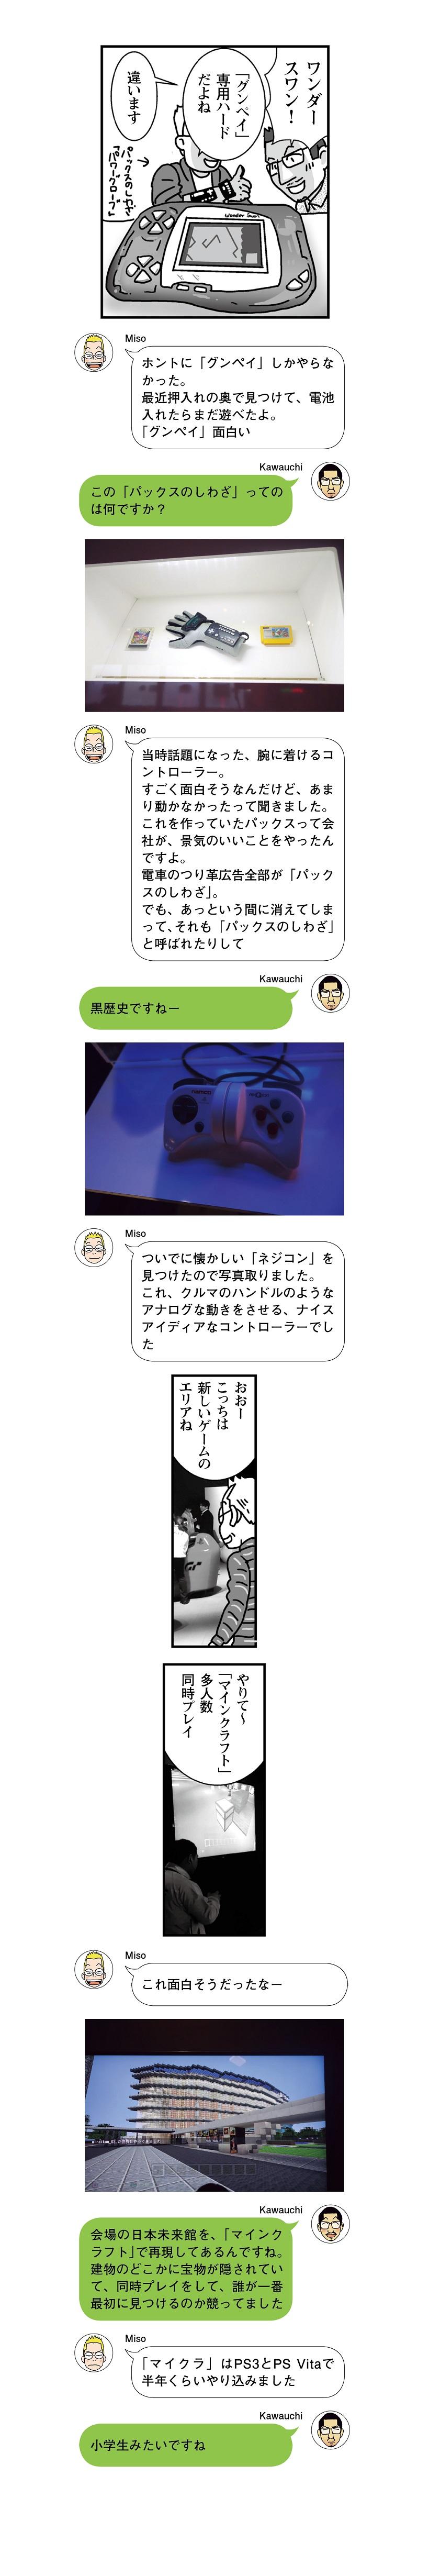 20160419_03